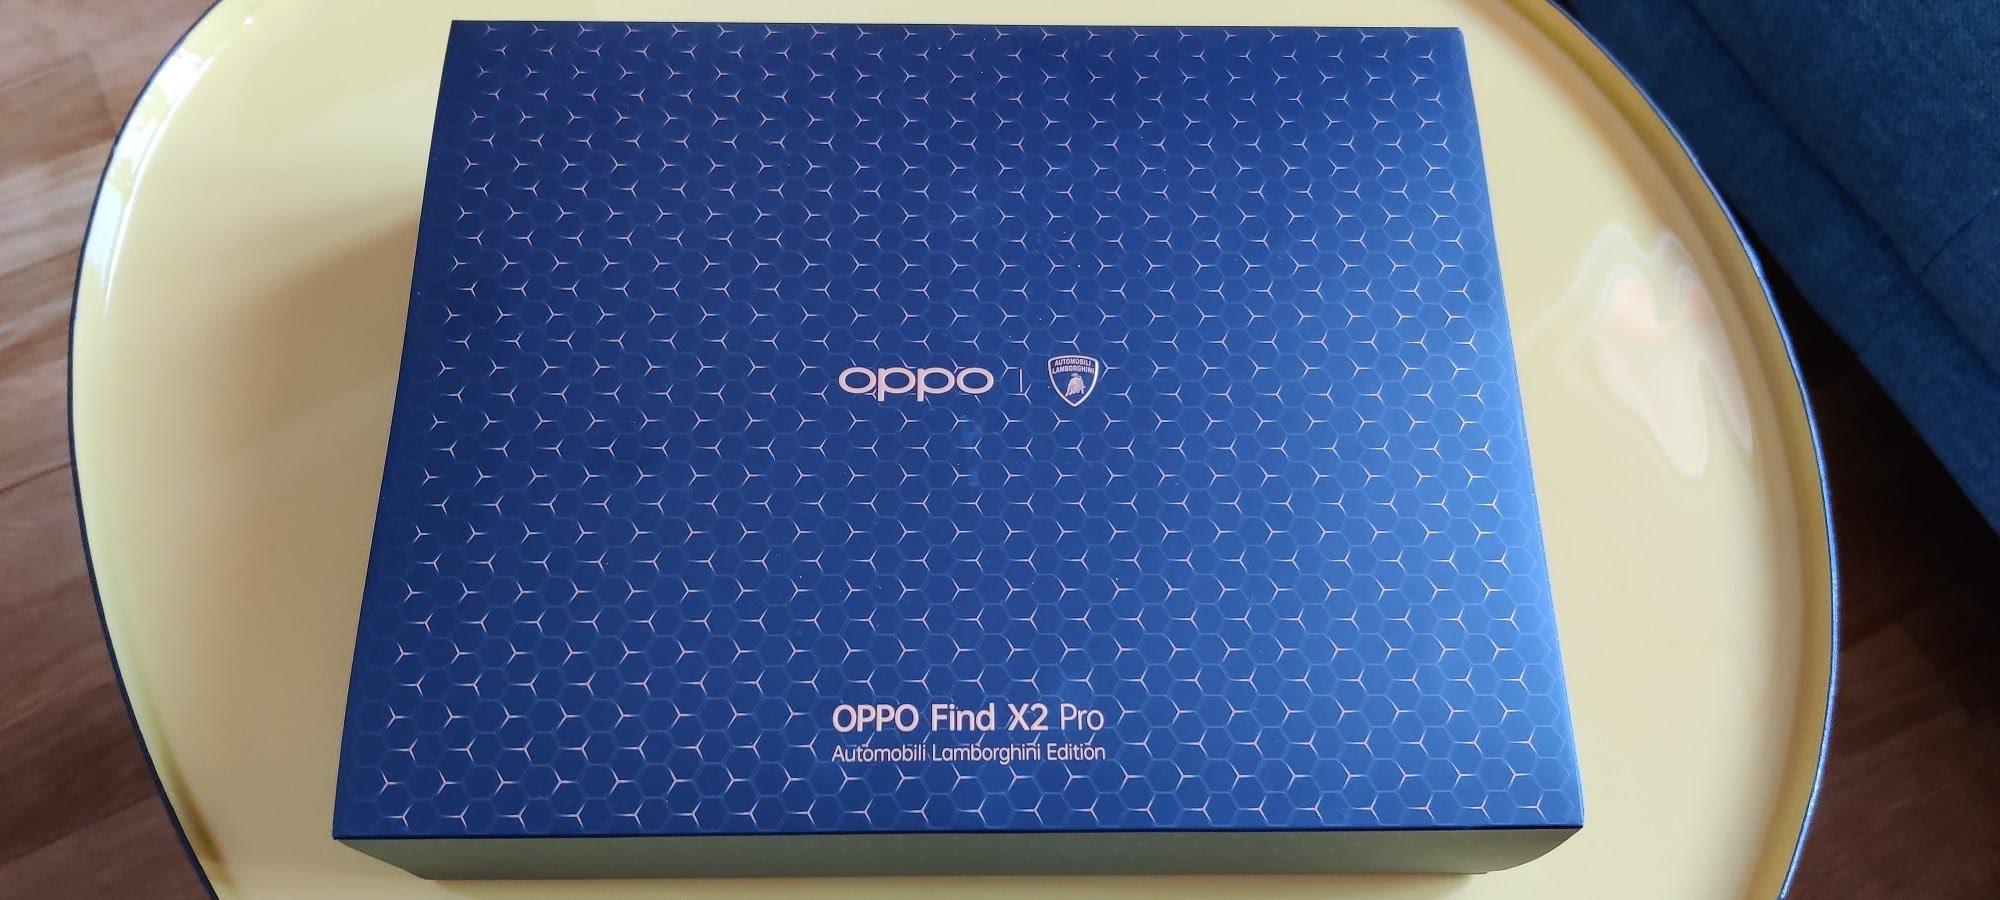 Unboxing du smartphone Oppo Find X2 Pro Lamborghini